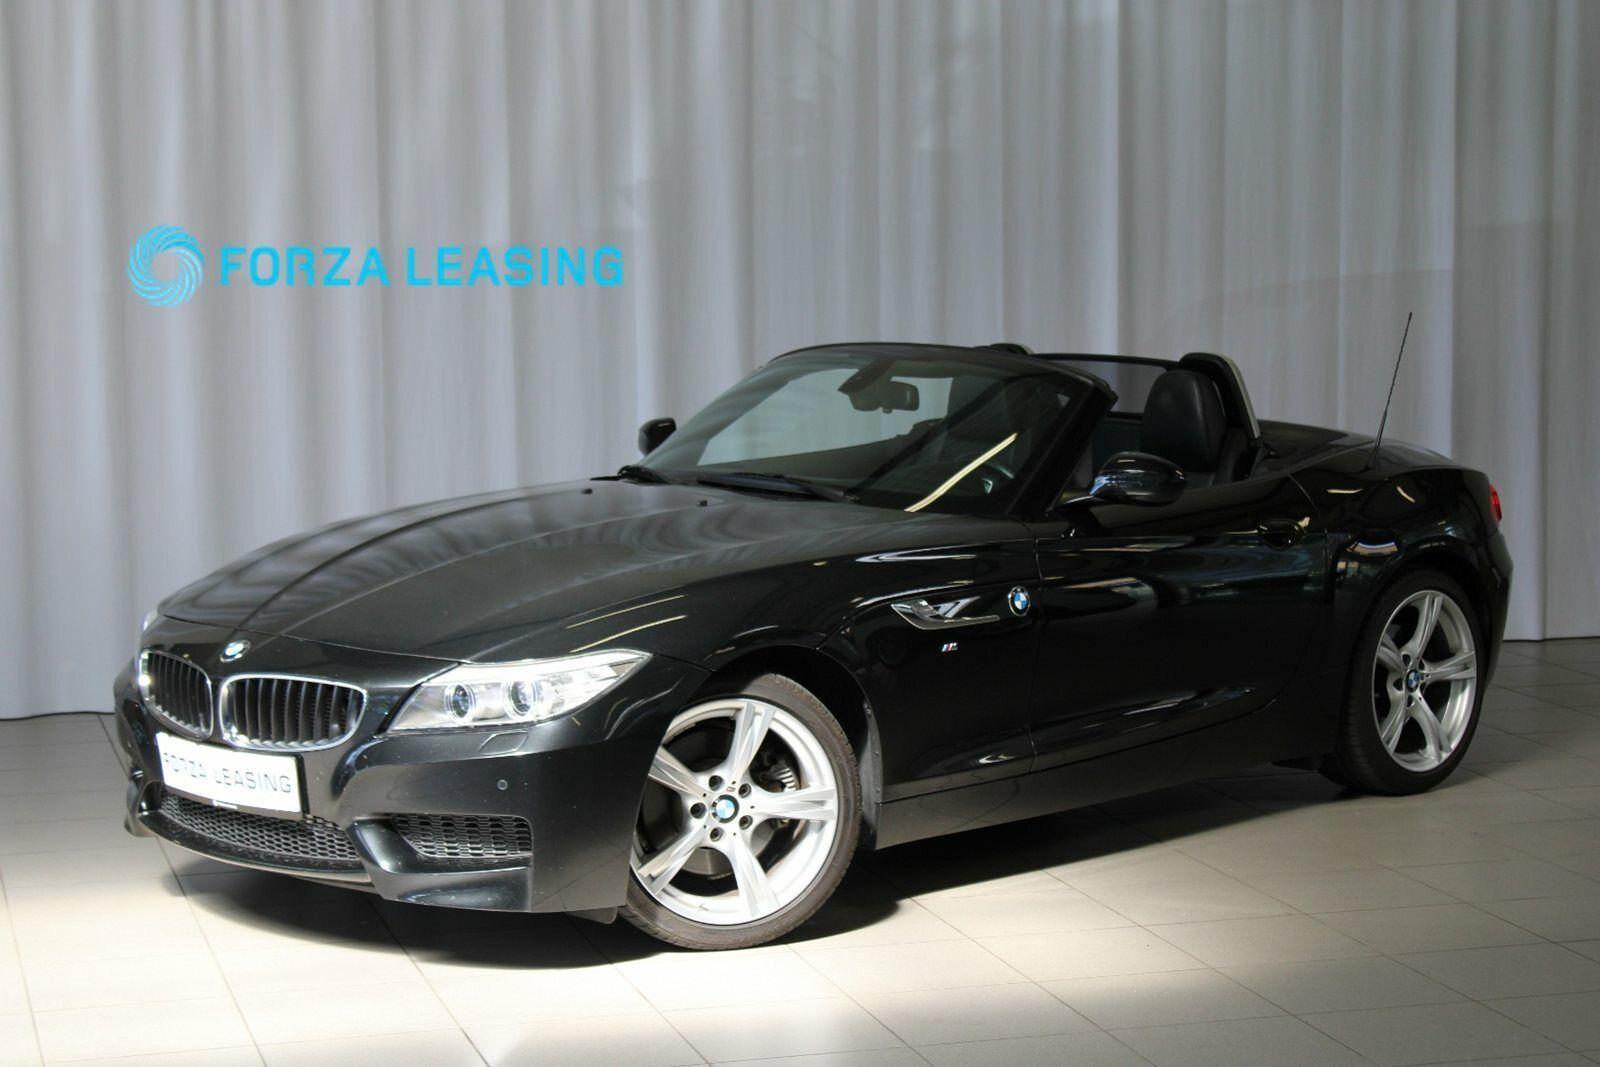 BMW Z4 2,0 sDrive28i Roadster aut. 2d - 3.200 kr.